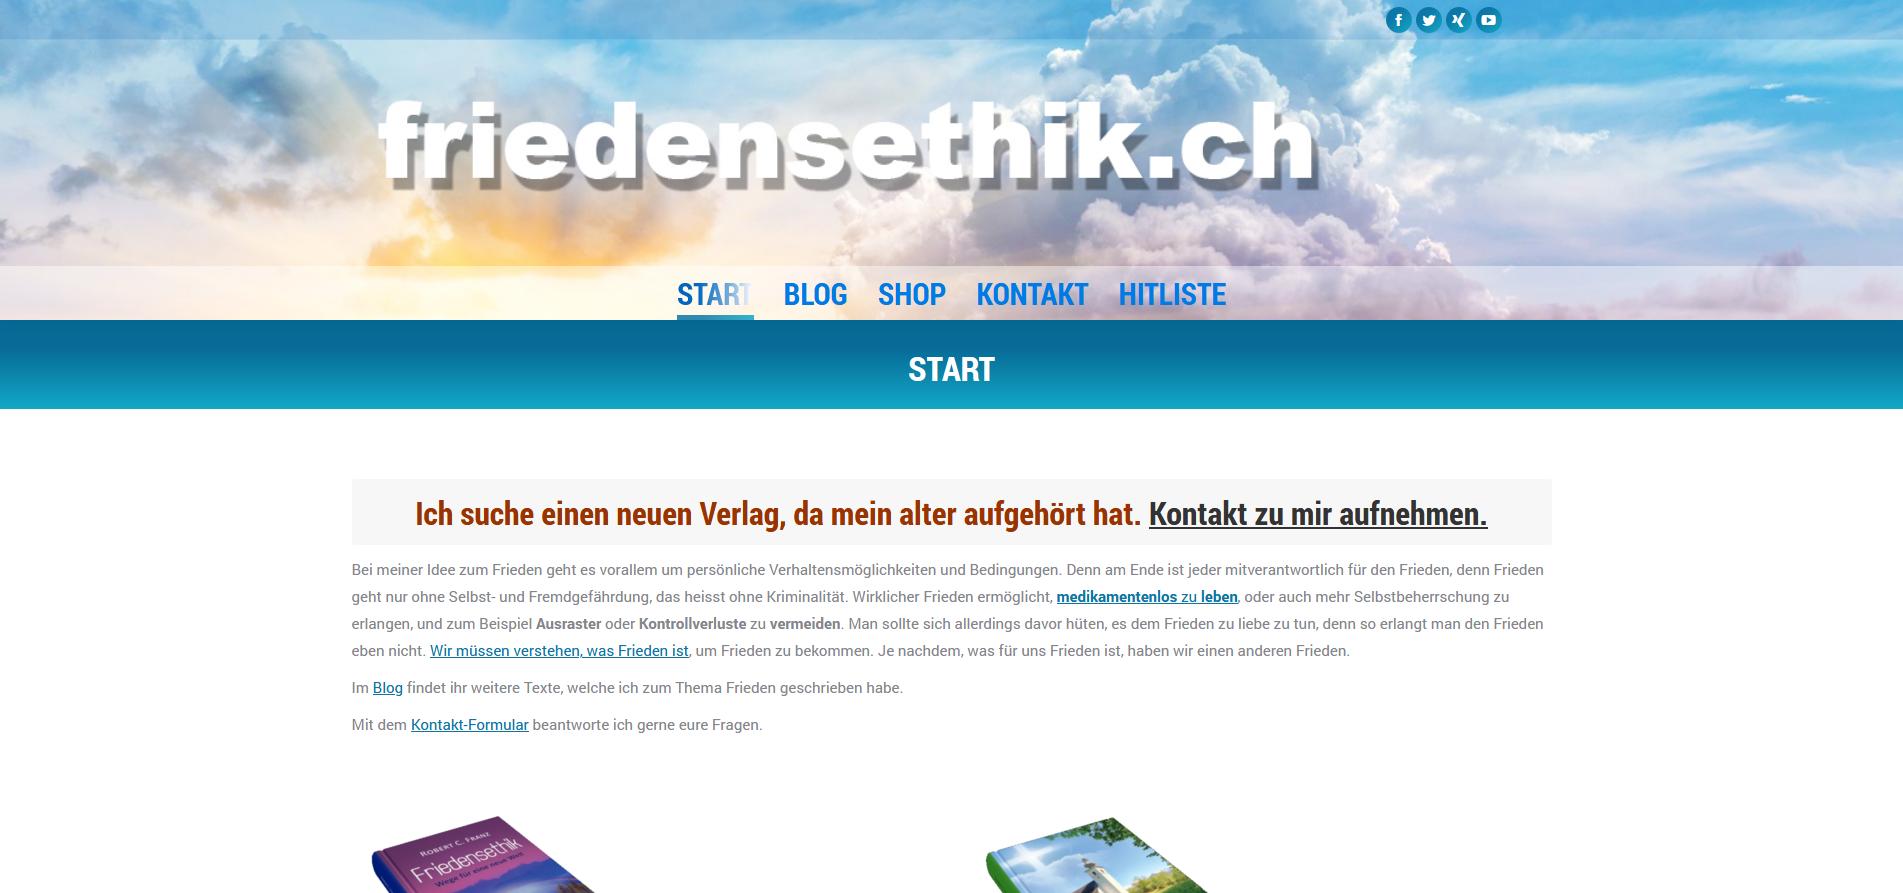 friedensethik.ch